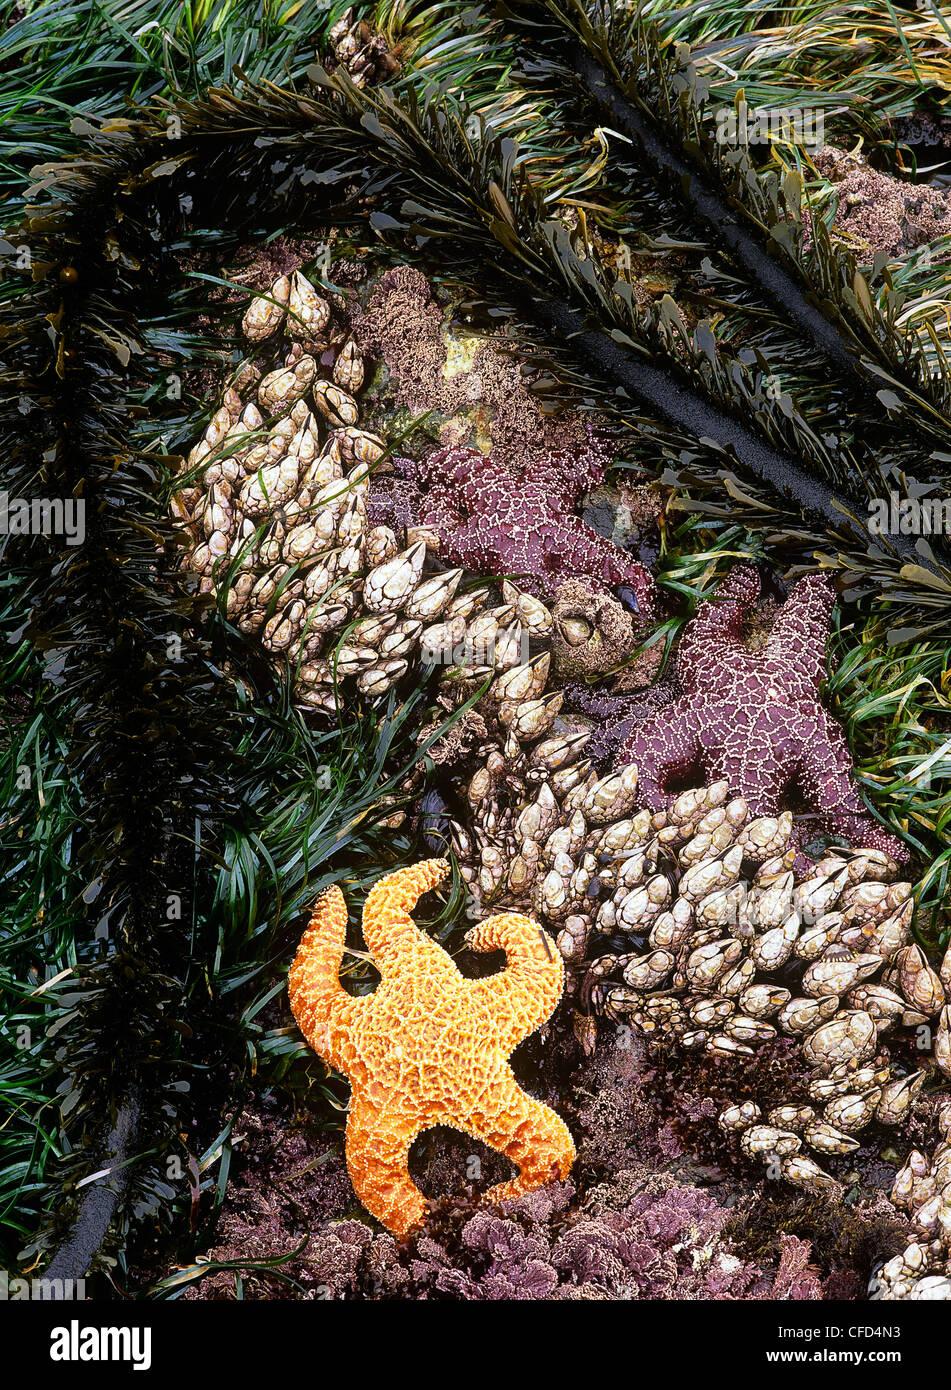 Intertidal life at low tide, Vancouver Island, British Columbia, Canada. - Stock Image